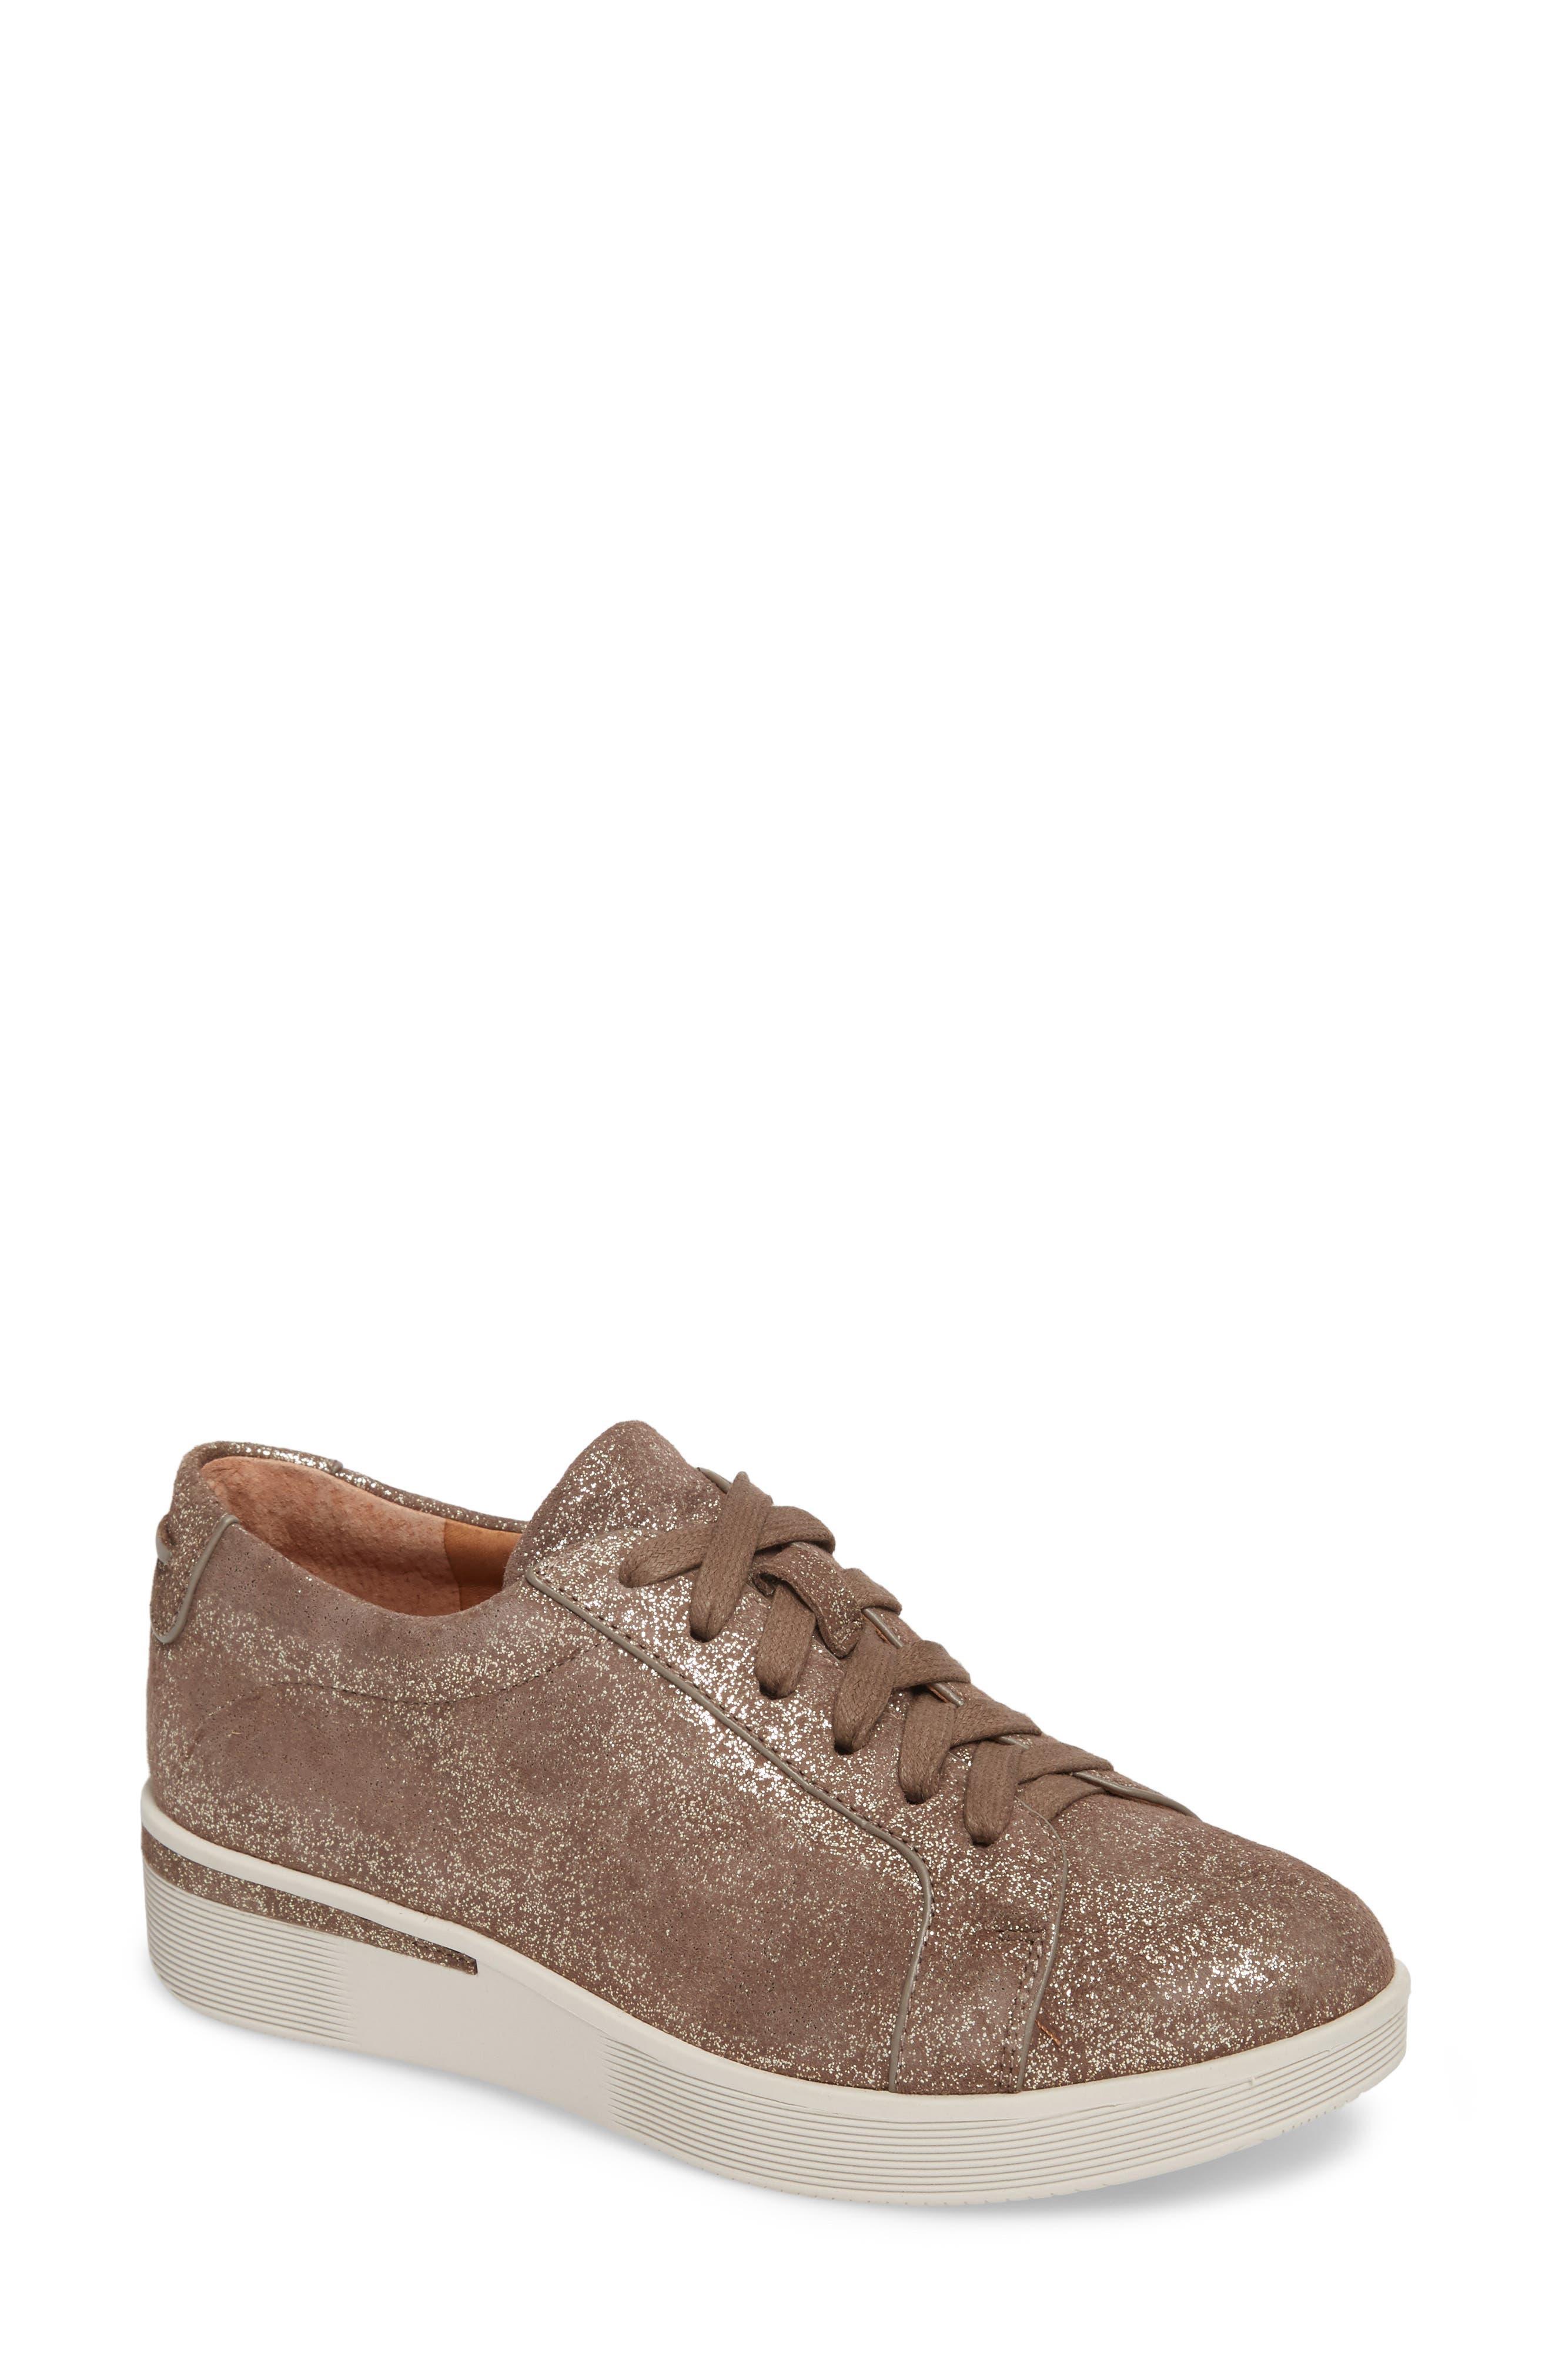 Image of GENTLE SOULS SIGNATURE Haddie Low Platform Sneaker